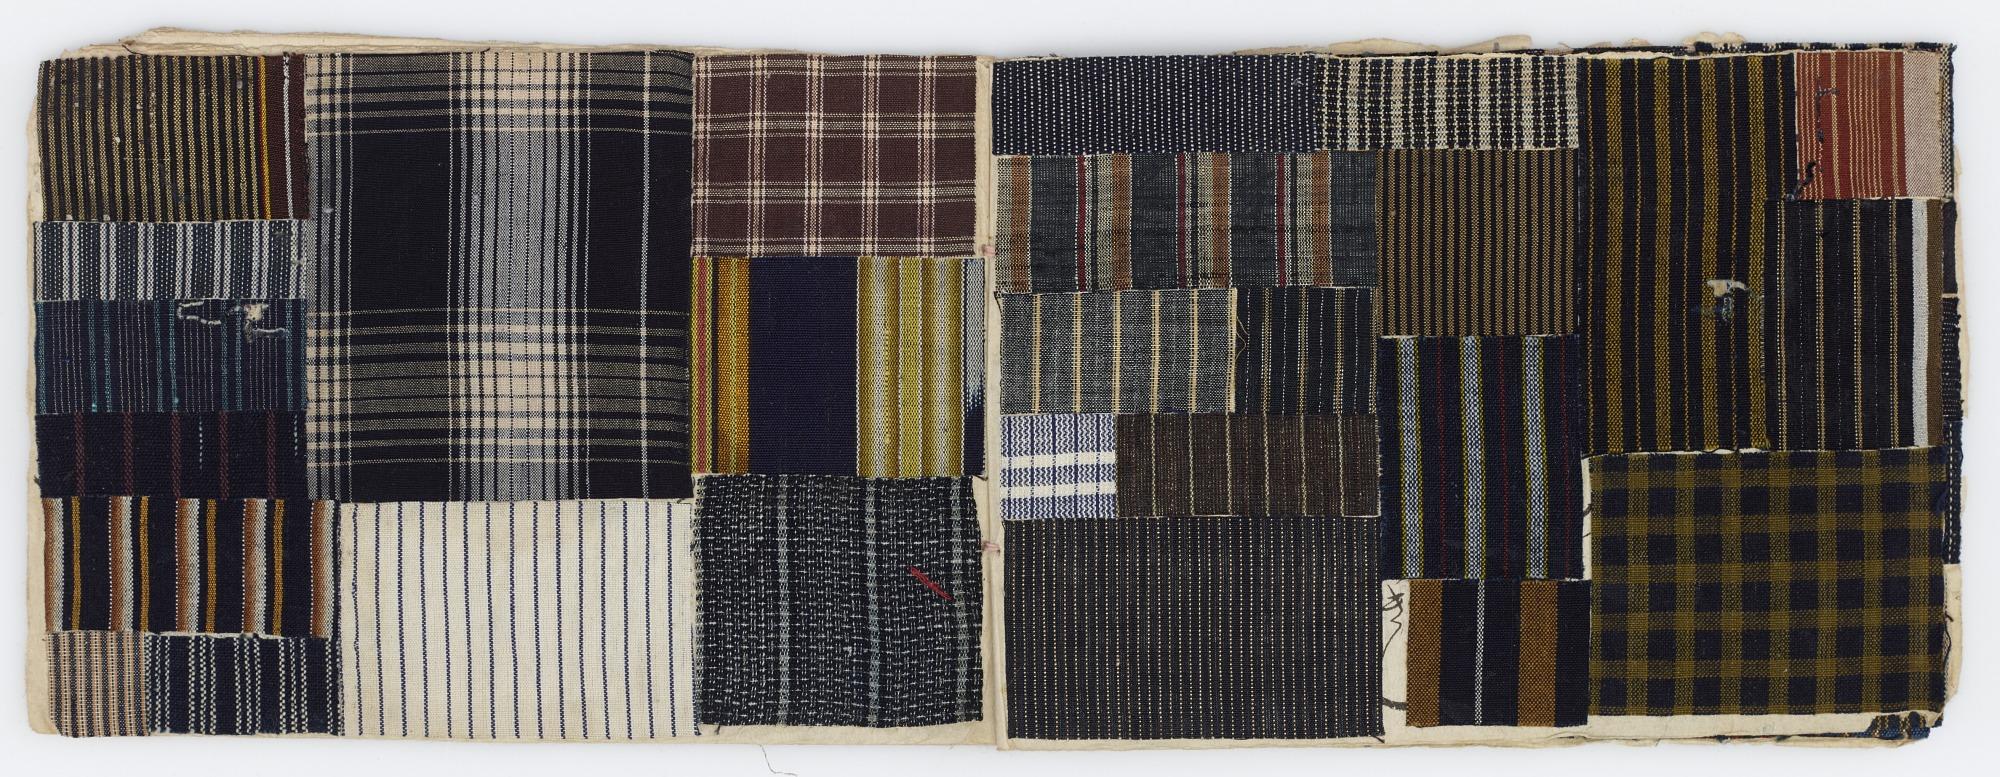 Notebook containing textile scraps